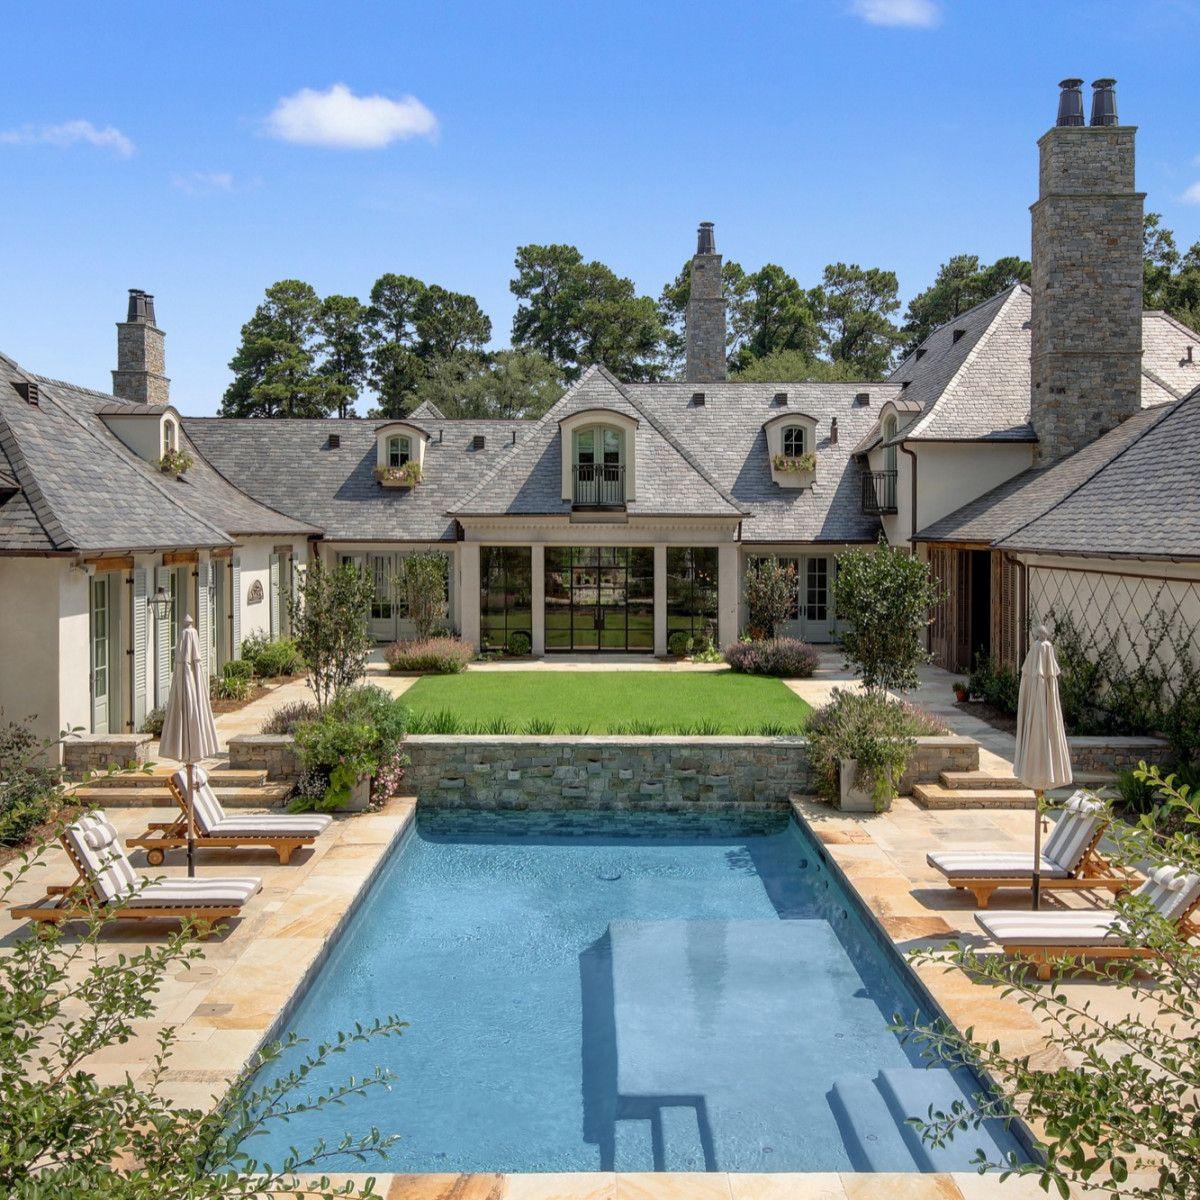 Jack Arnold Dream Home Plan Home Design House Plans Dream House Plans How To Plan